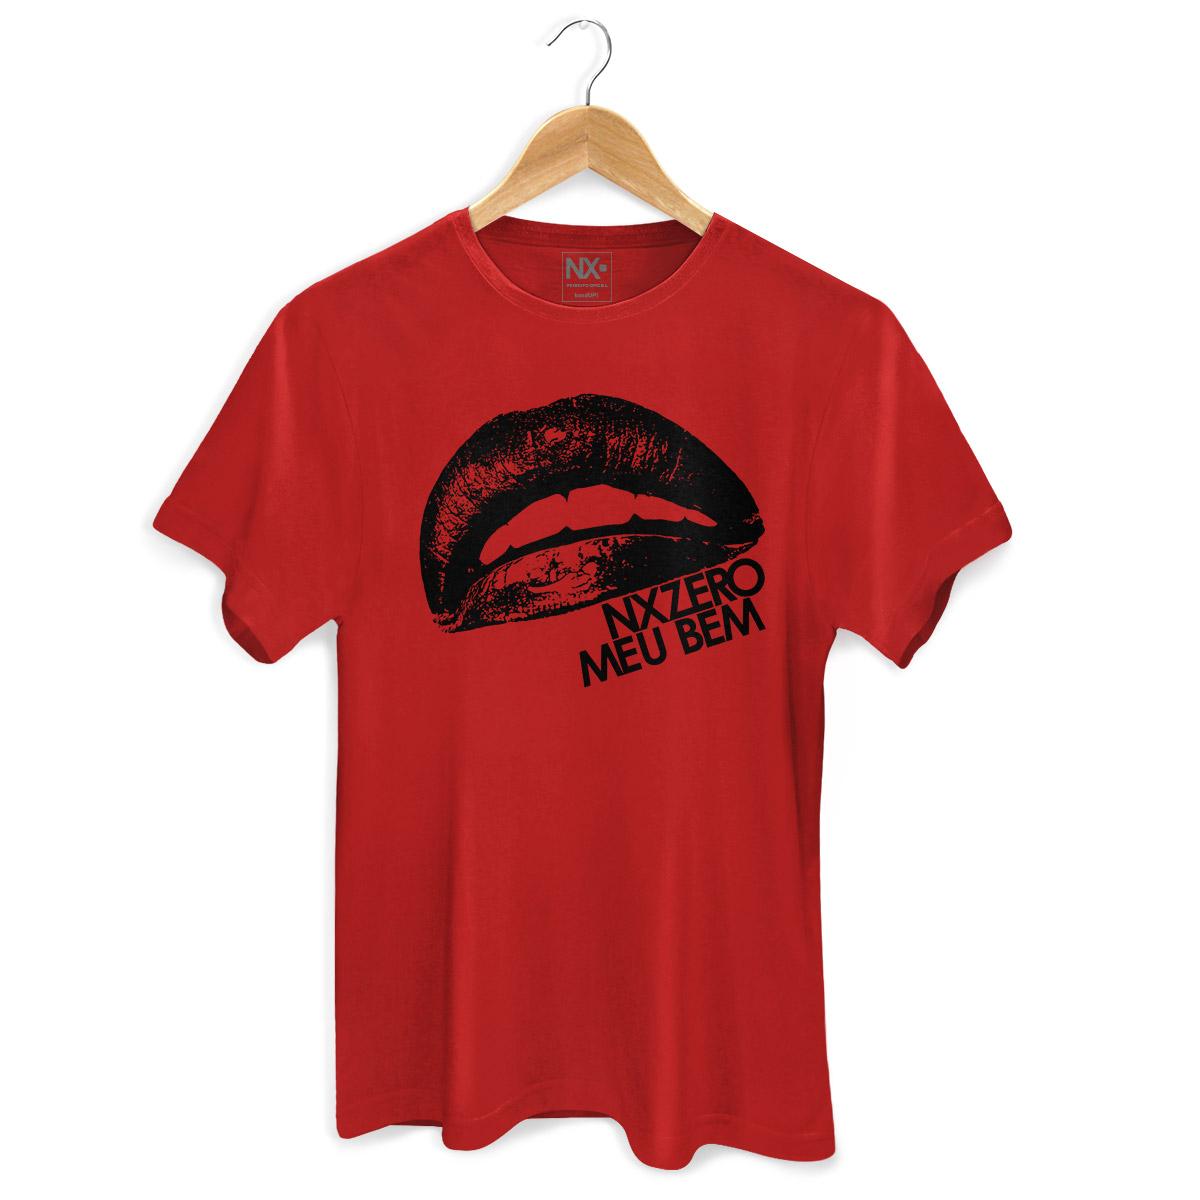 Camiseta Masculina NXZero Meu Bem